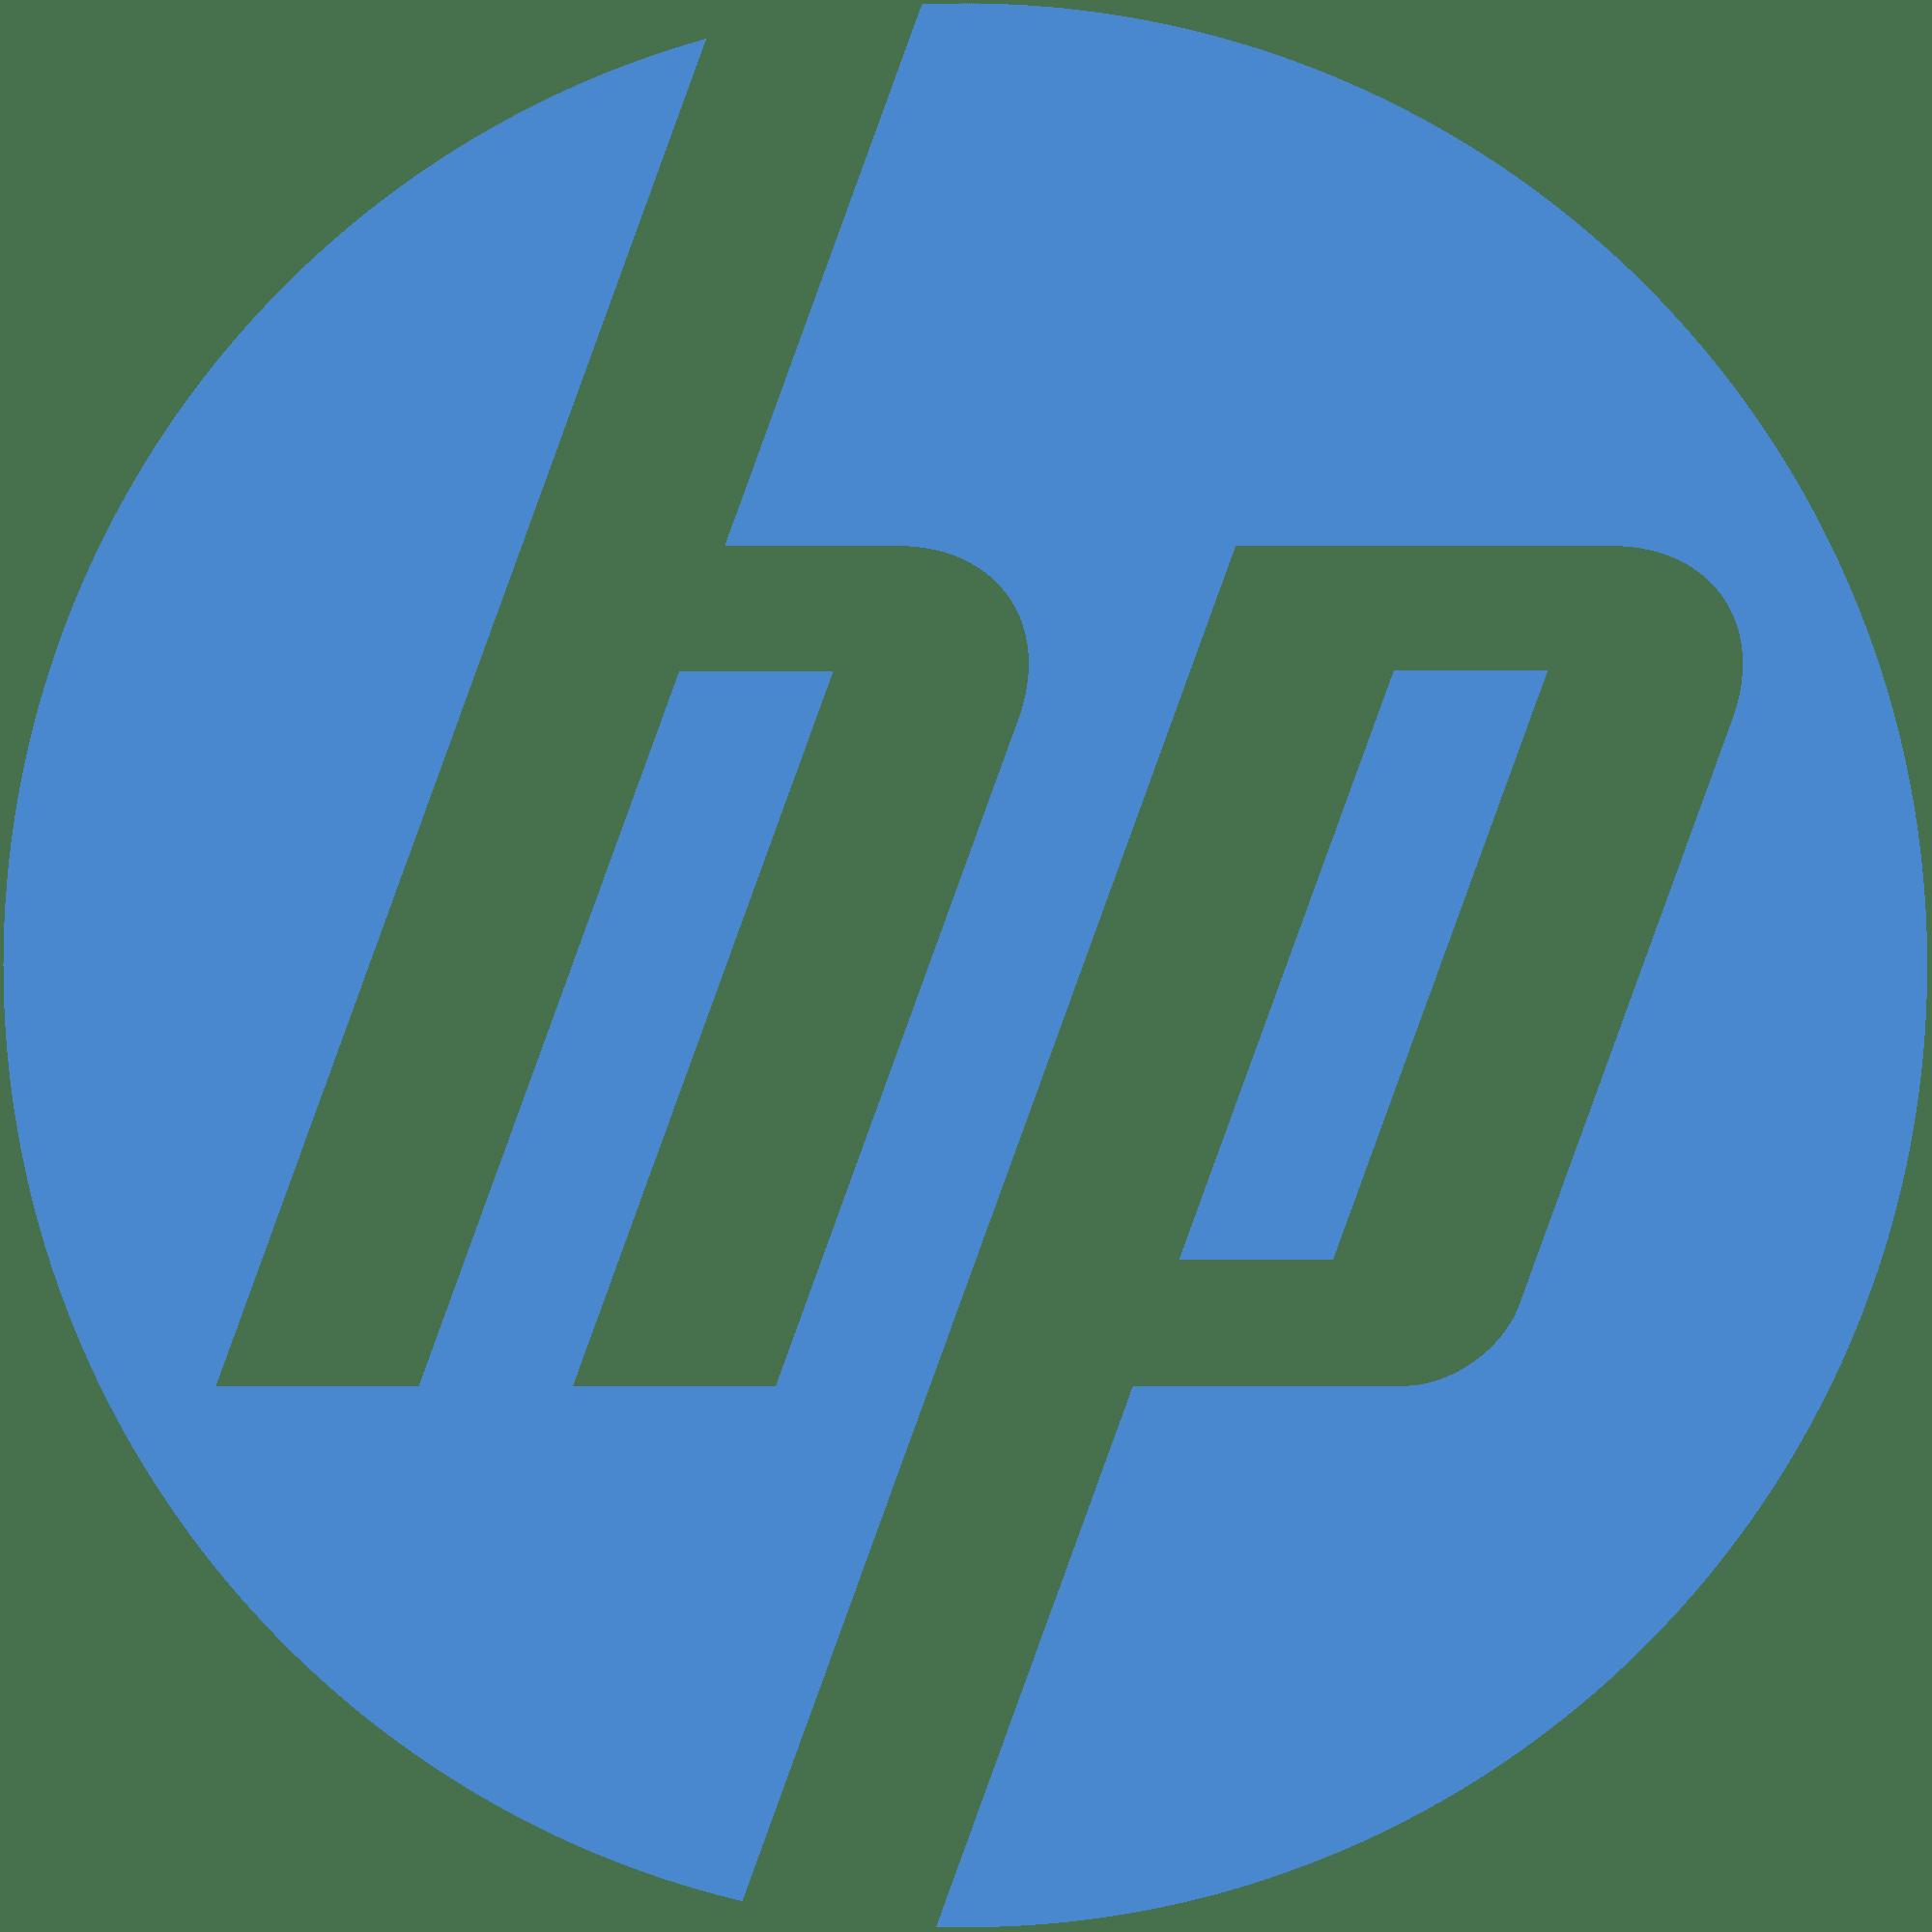 HP Officejet 6500 Wireless Printer E709n Driver